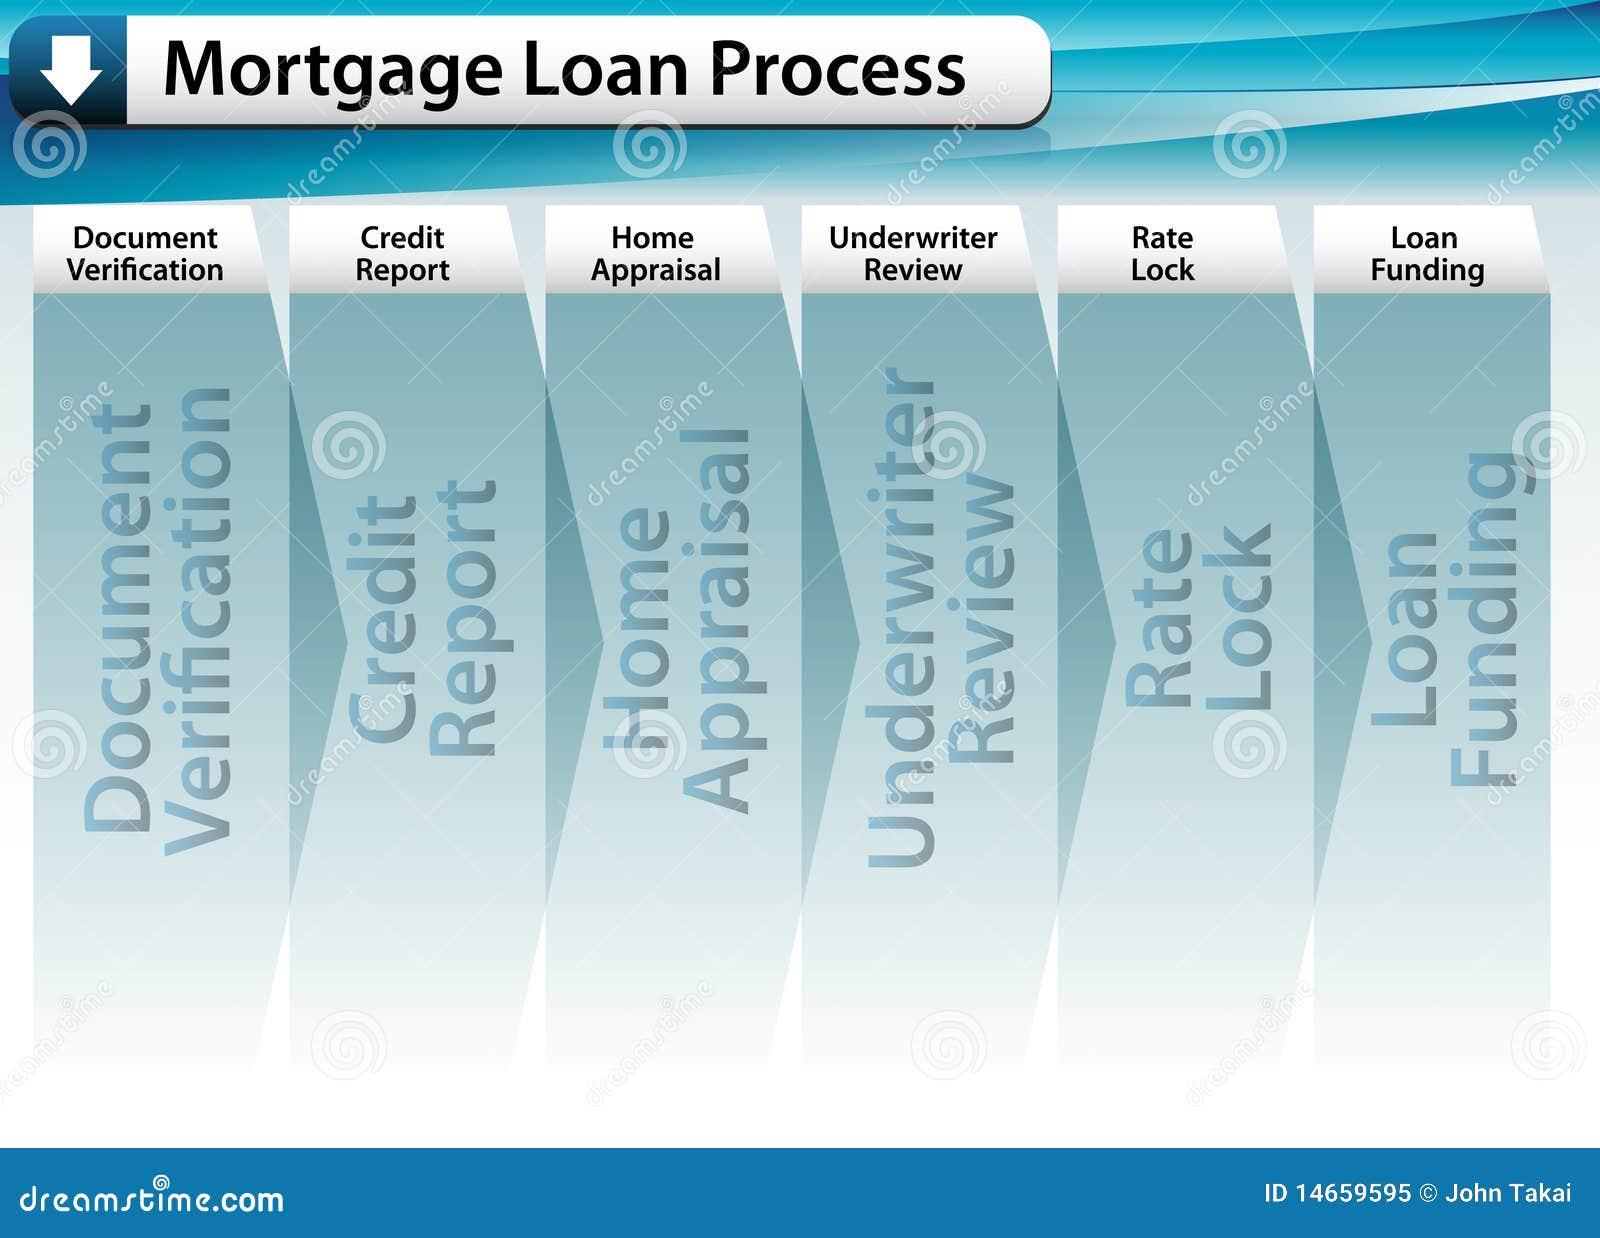 Mortgage Loan Process Royalty Free Stock Photo - Image: 14659595